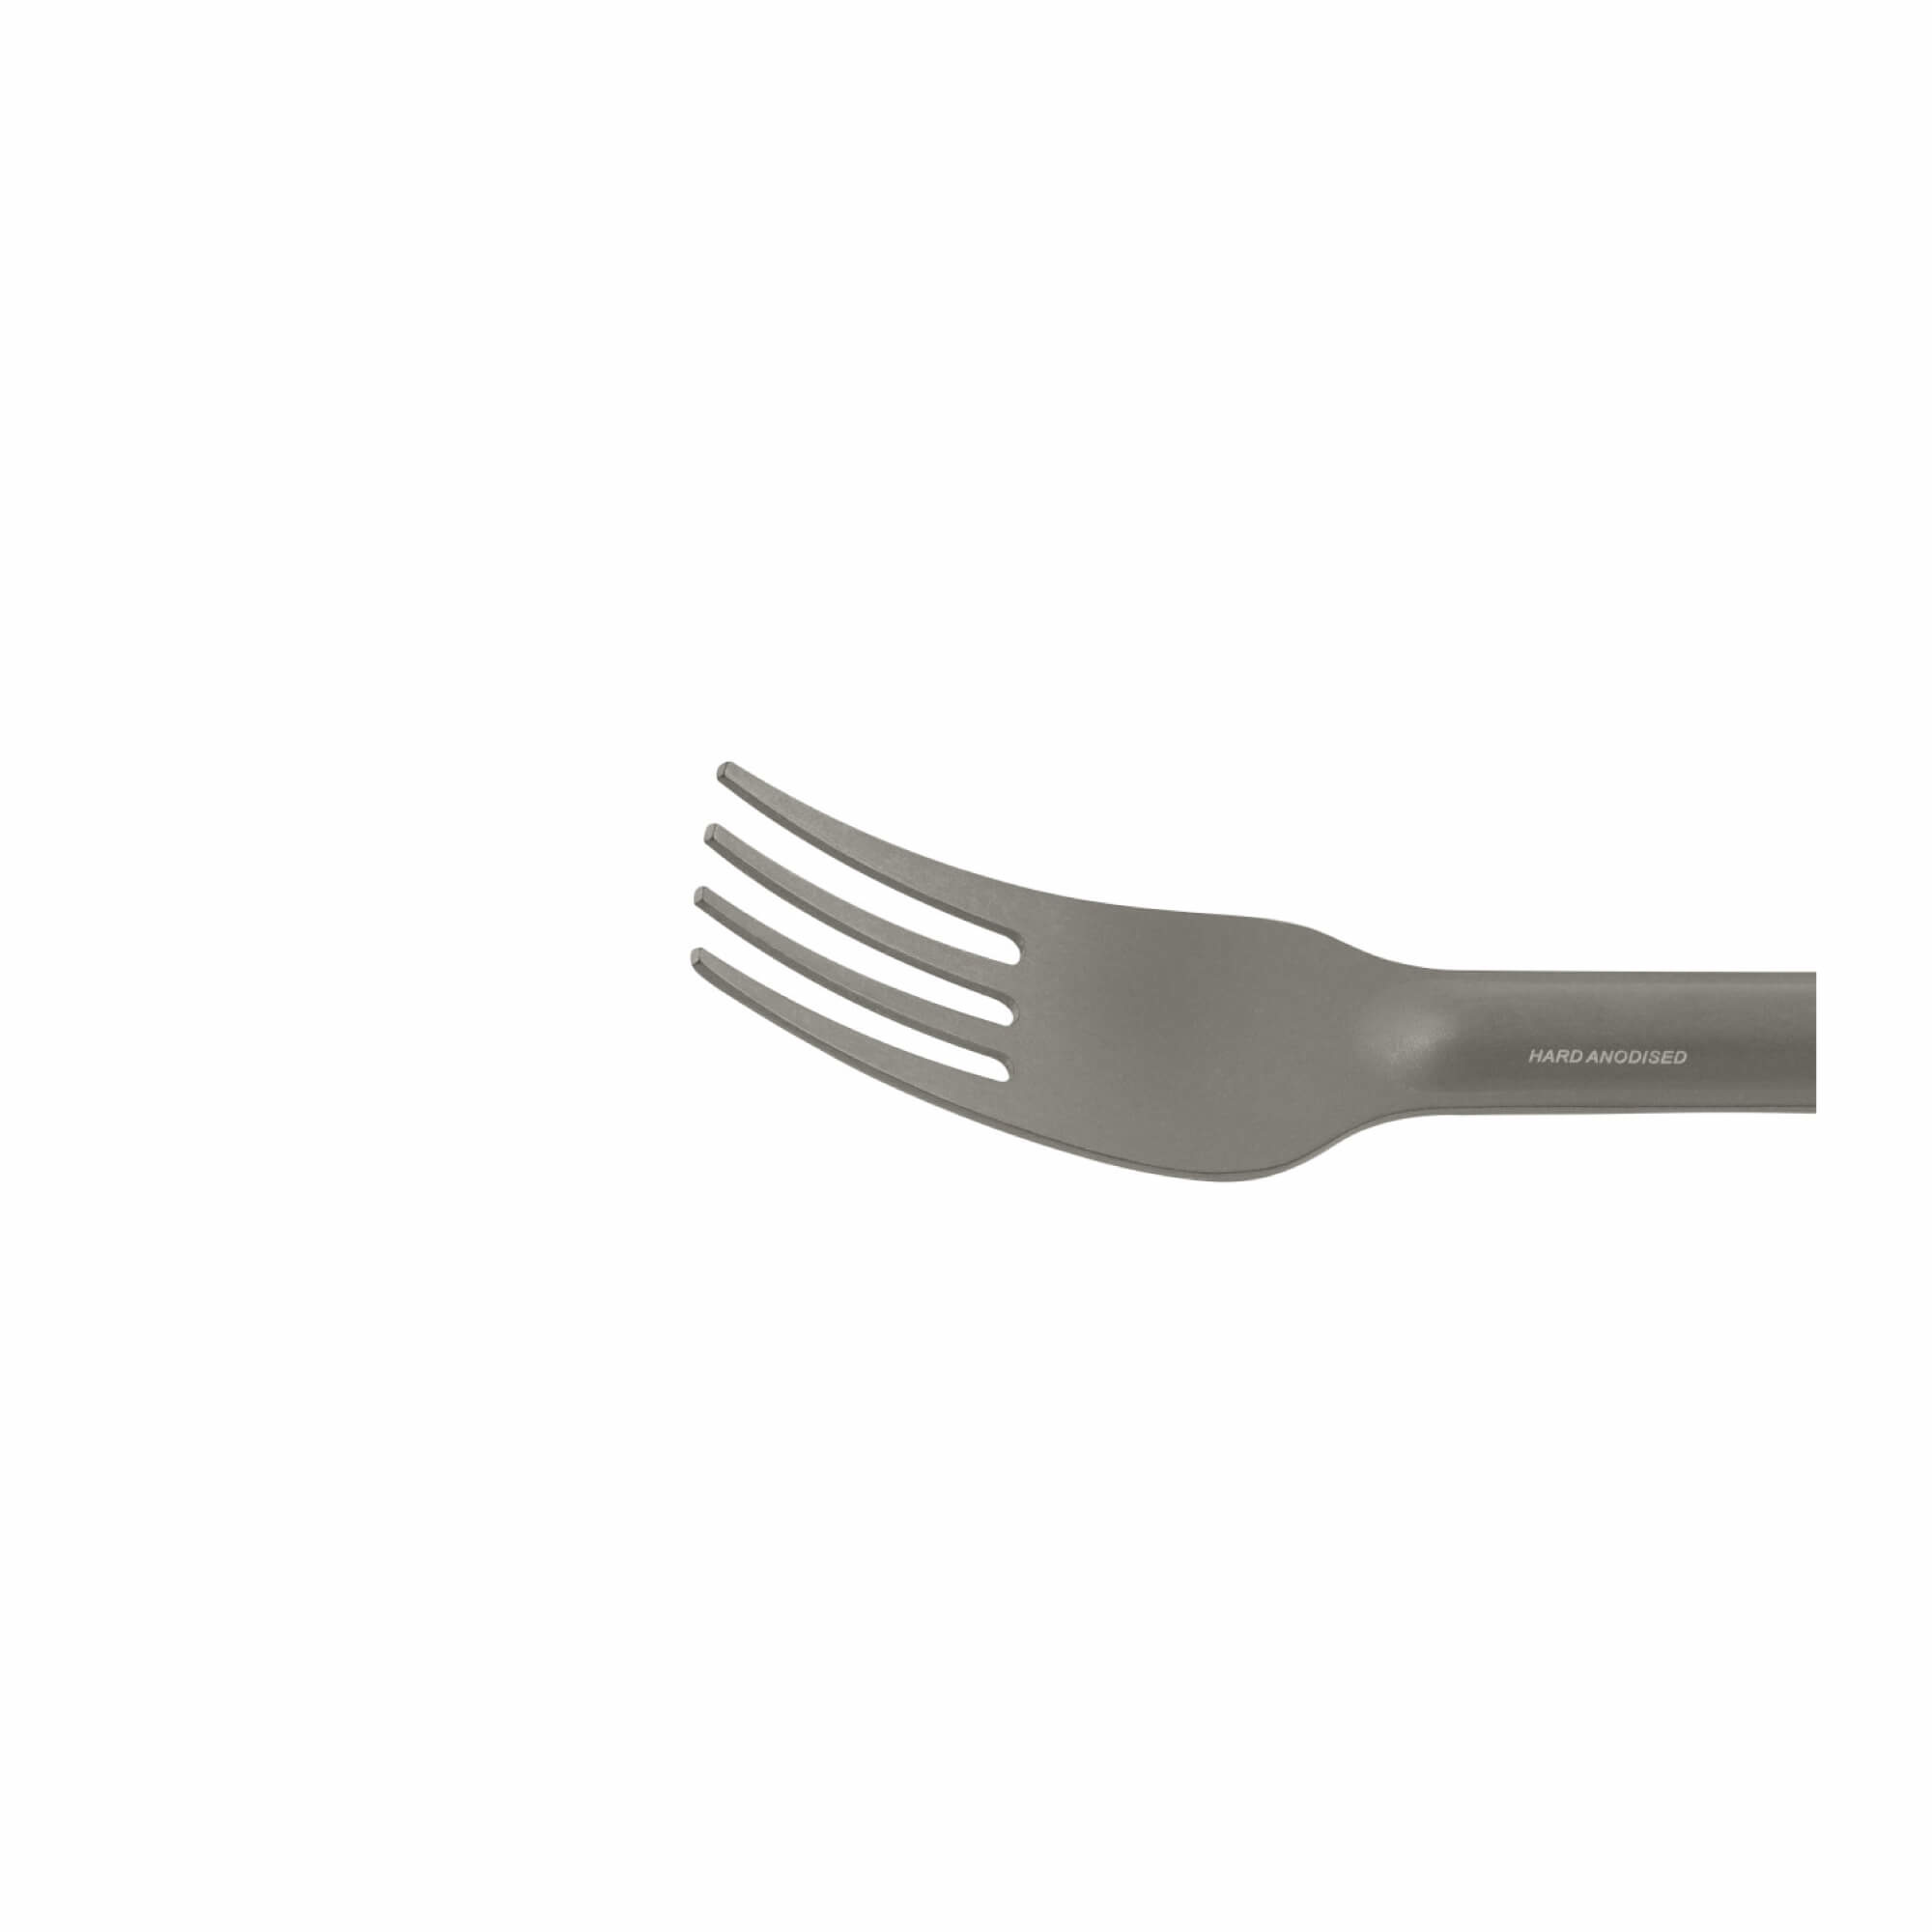 Alphalight Cutlery Set 3pce-6